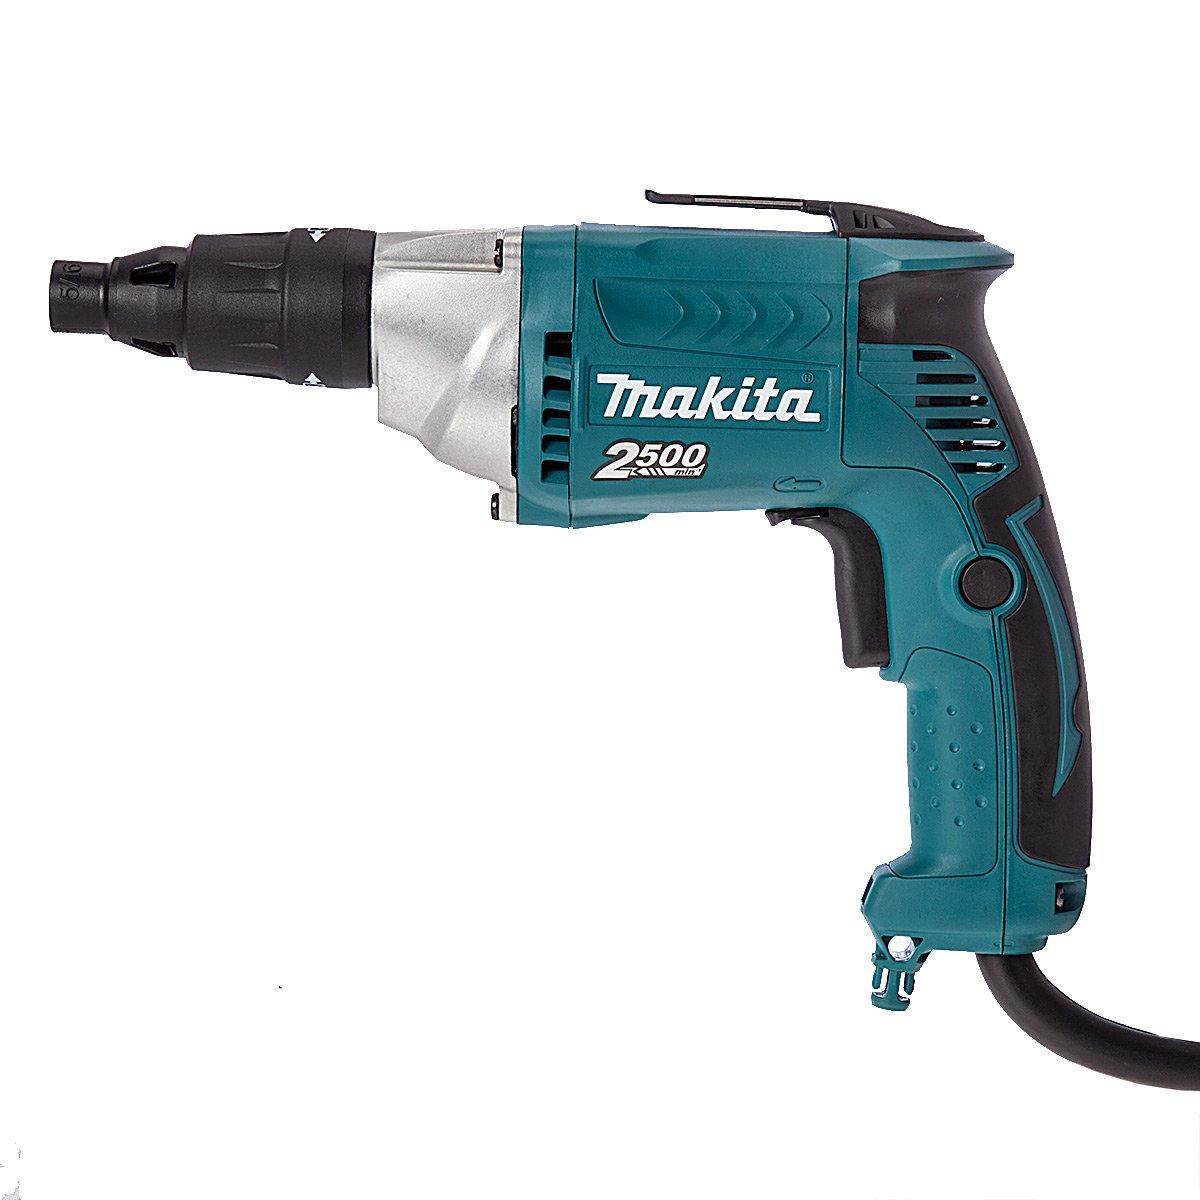 Makita FS2500 2,500 RPM Screwdriver by Makita (Image #2)